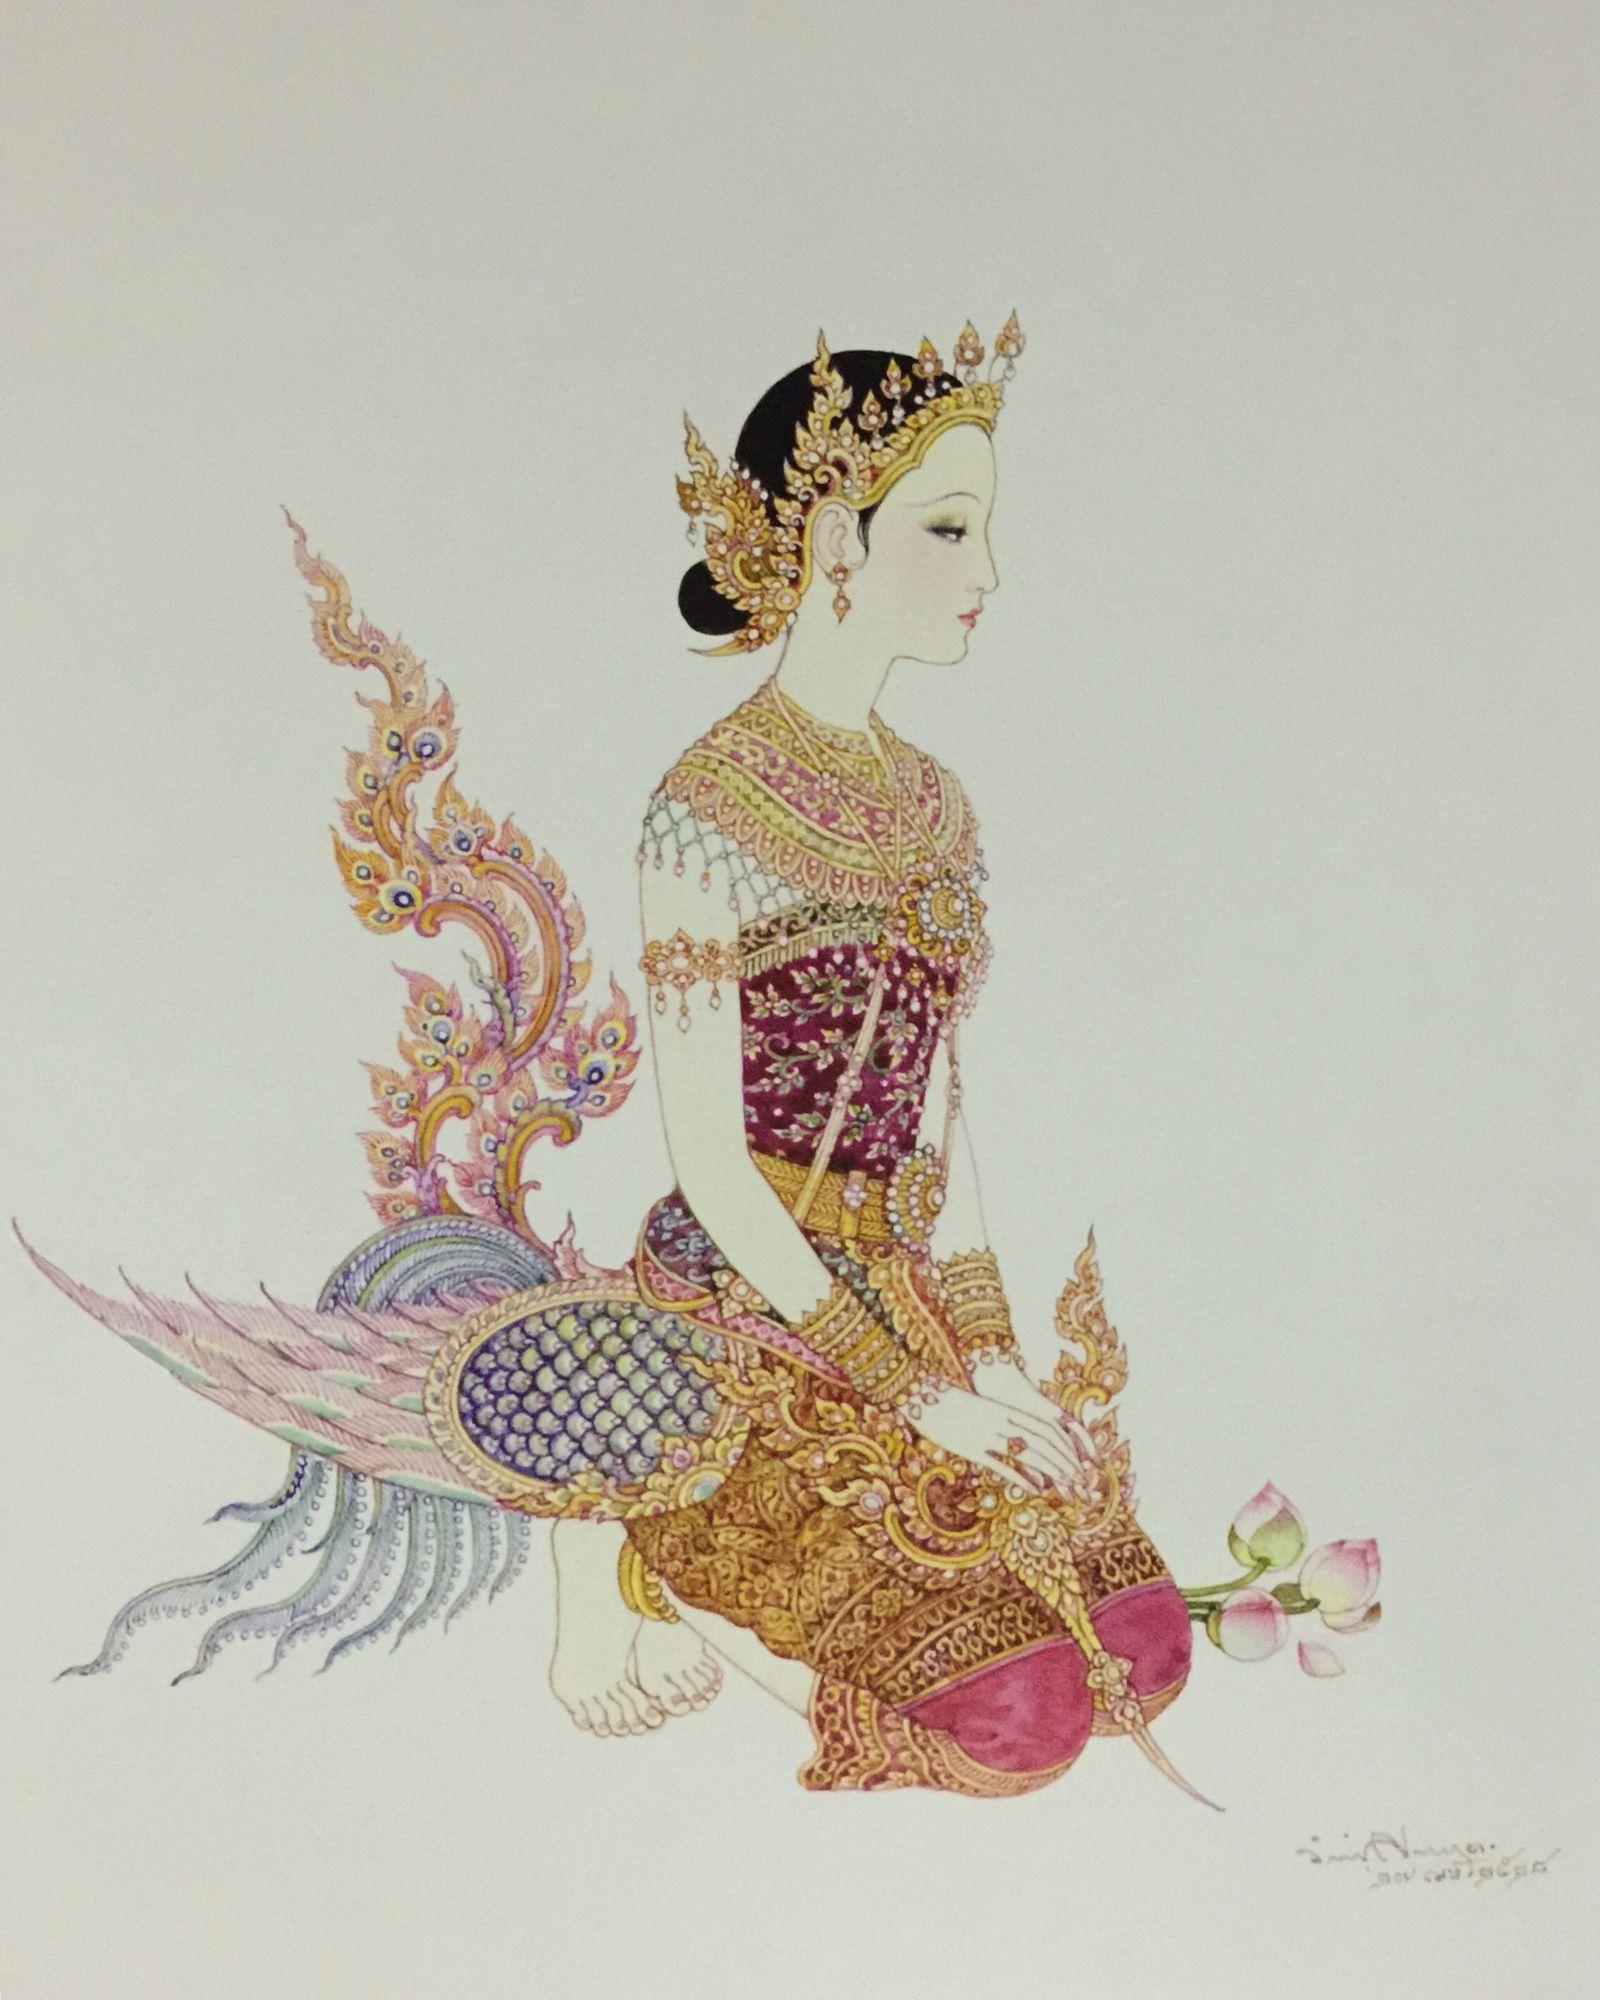 """A kinnari in a tiara"", 1985, watercolor on paper, by a Thai national artist Chakrabhand Posayakrit"